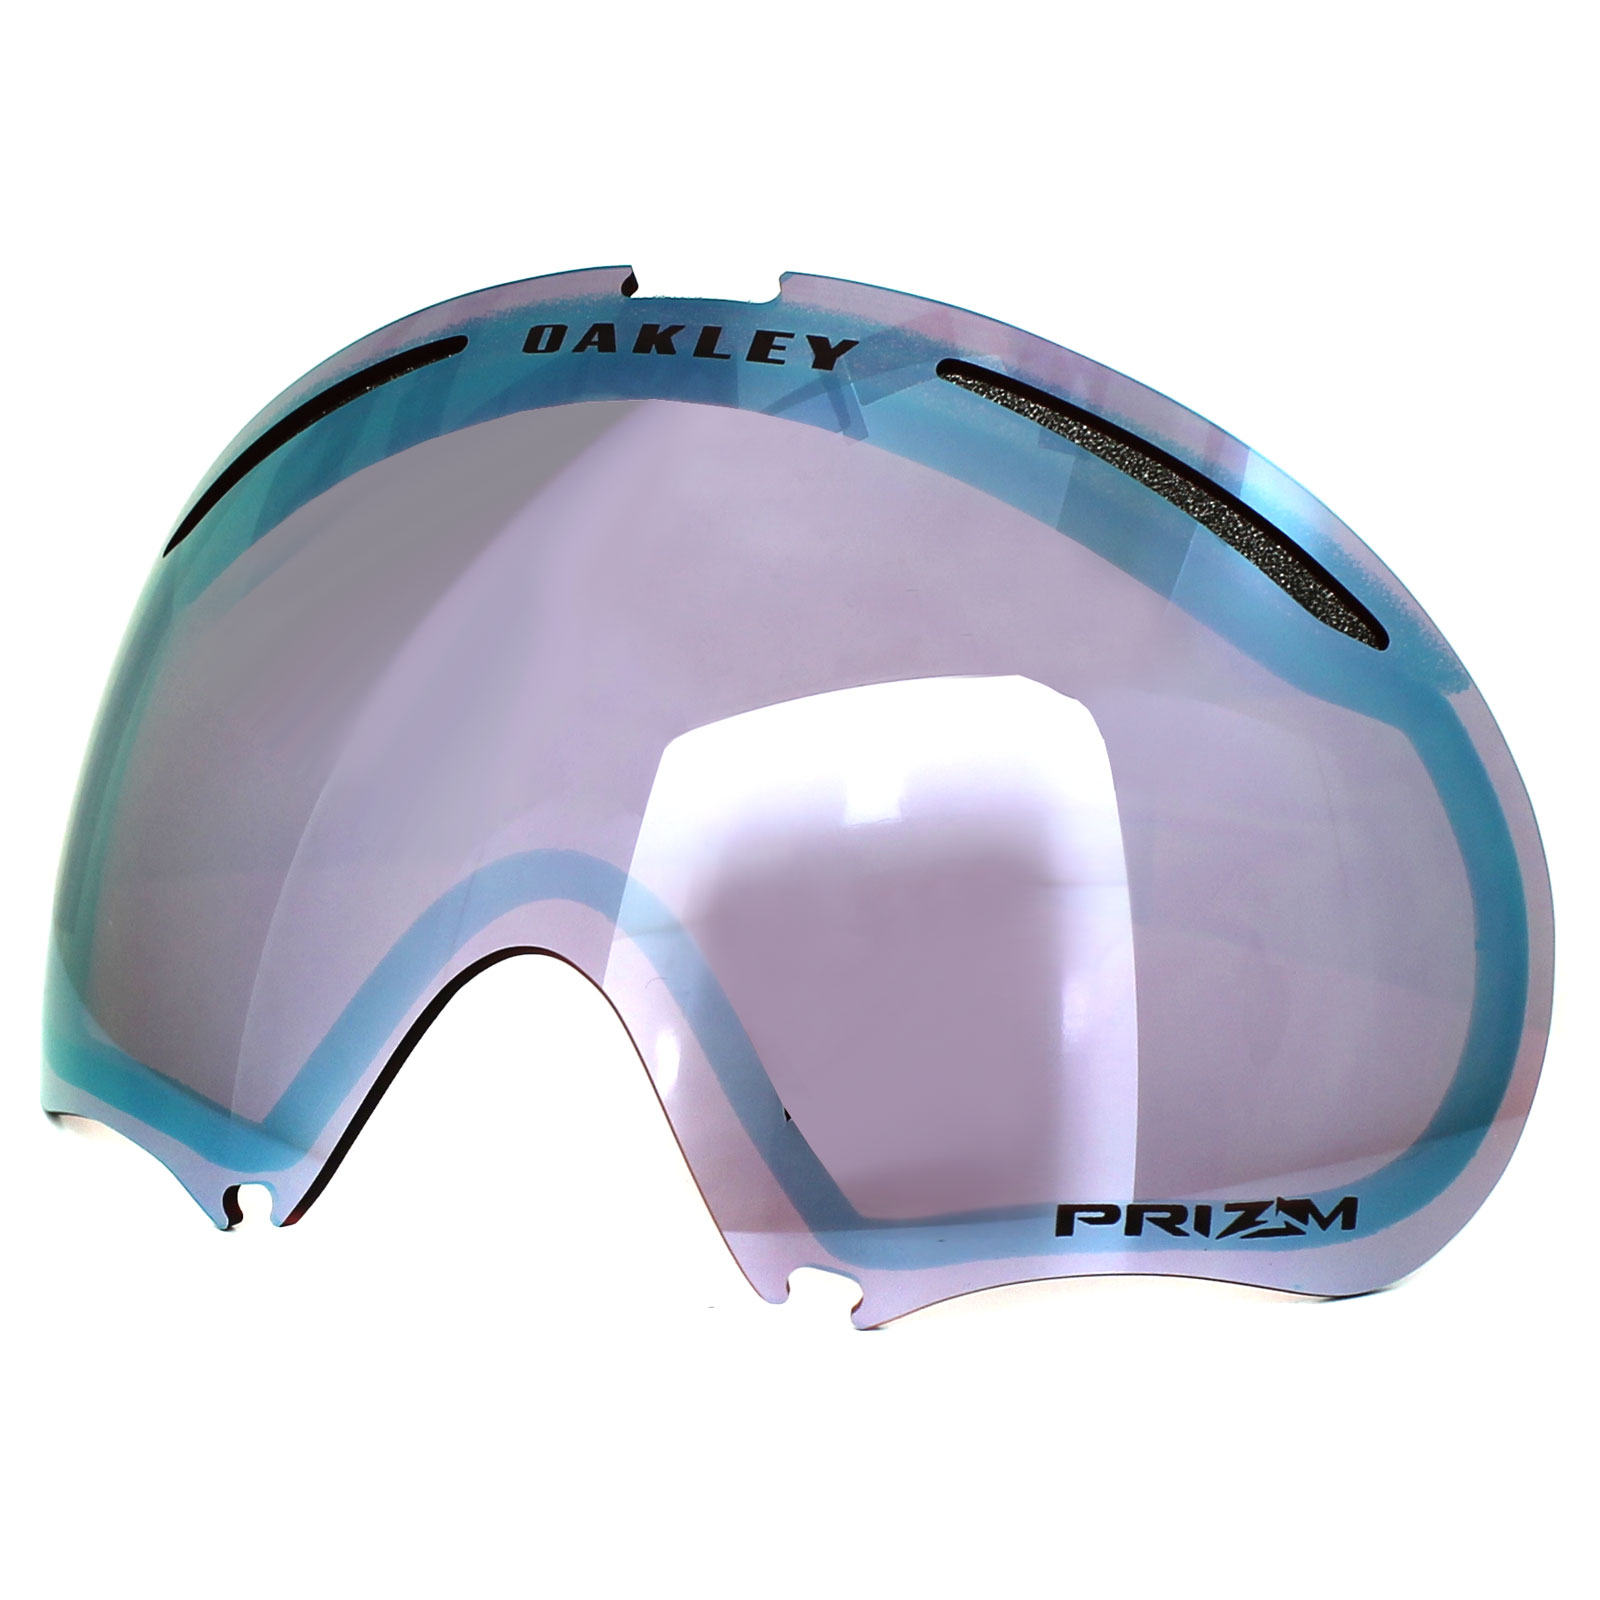 9faaf84131be Sentinel Oakley Ski Goggles Replacement Lens A Frame 2.0 Prizm Sapphire  Iridium